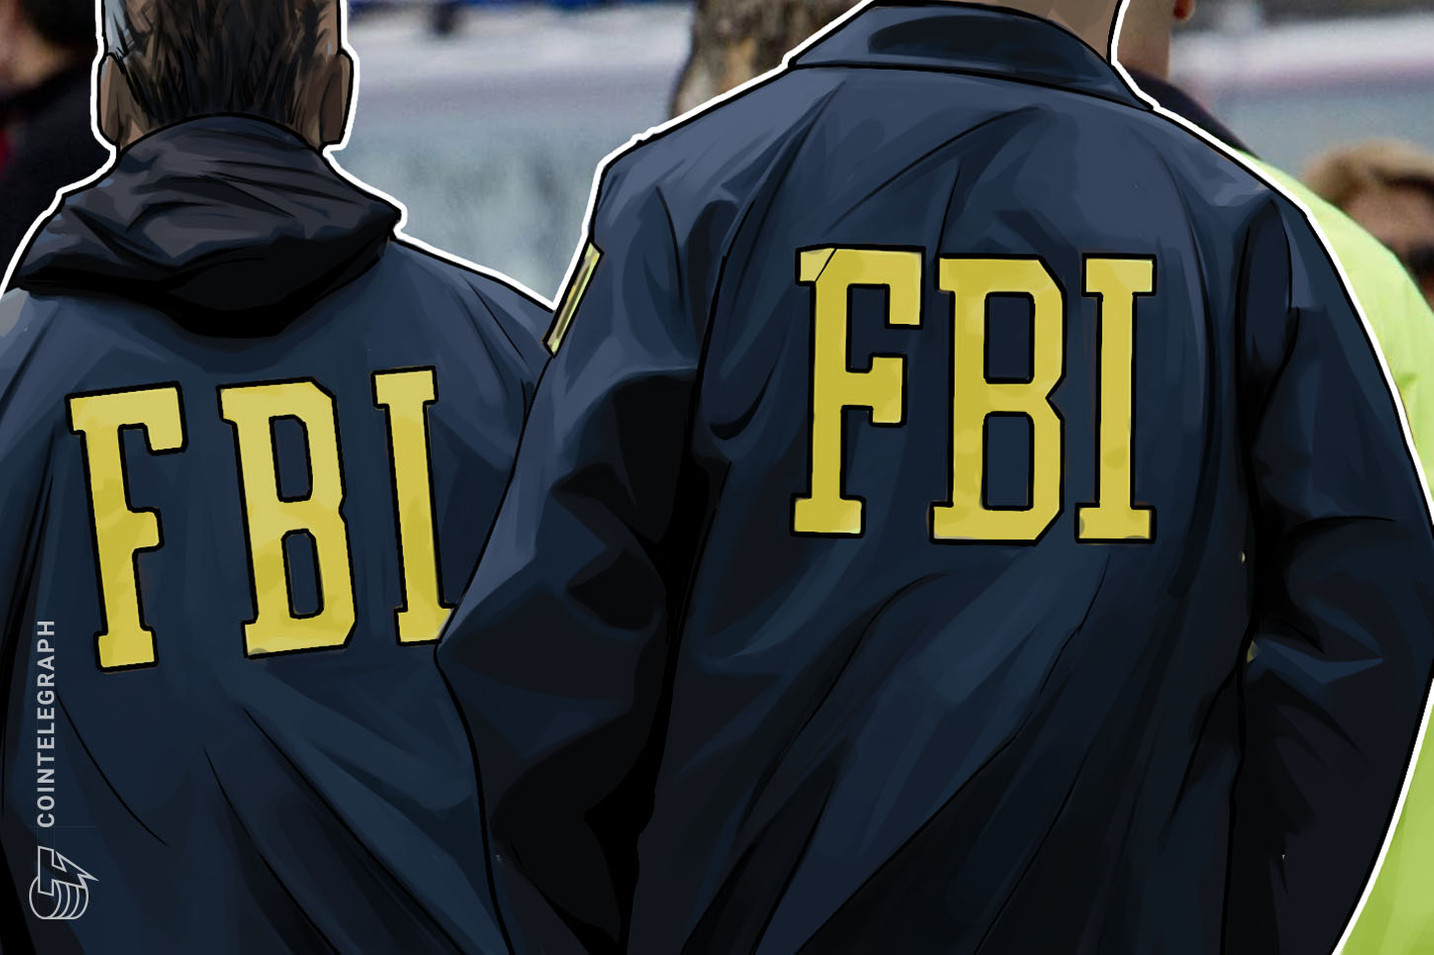 USA: FBI-Razzia bei Tech-Zentrum wegen unerlaubtem Kryptohandel